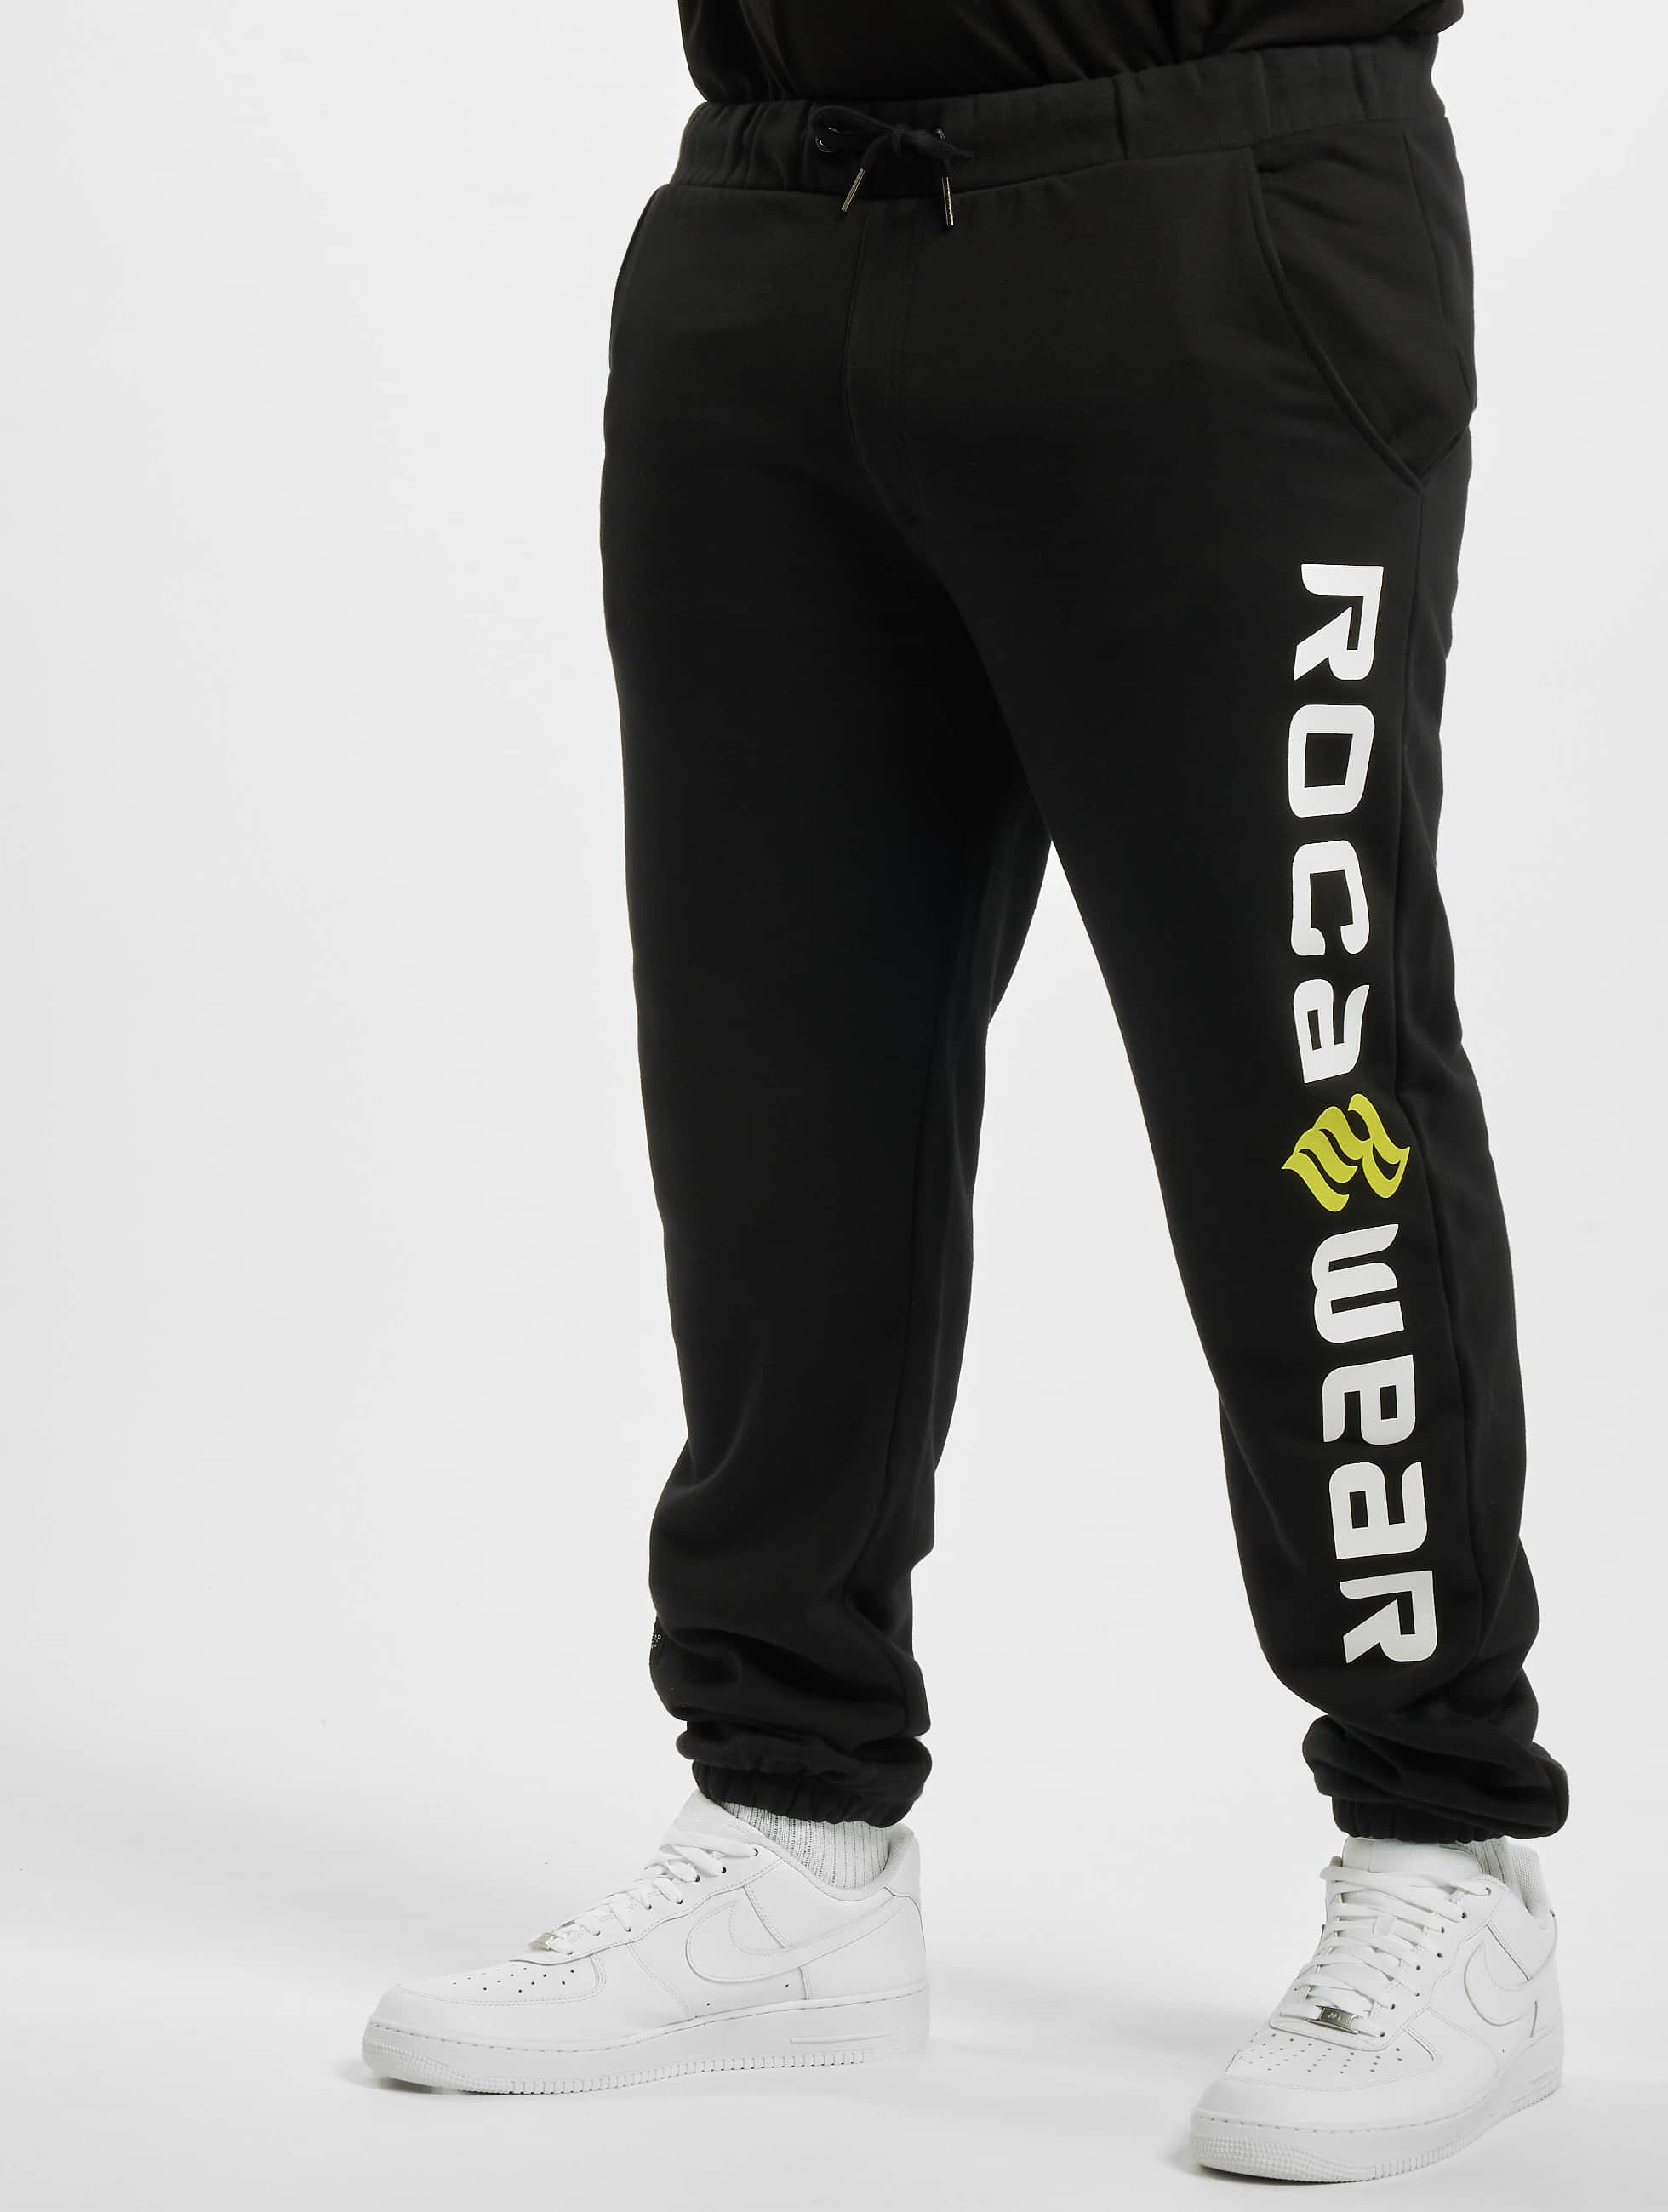 Rocawear / Sweat Pant Big Basic in black 9XL